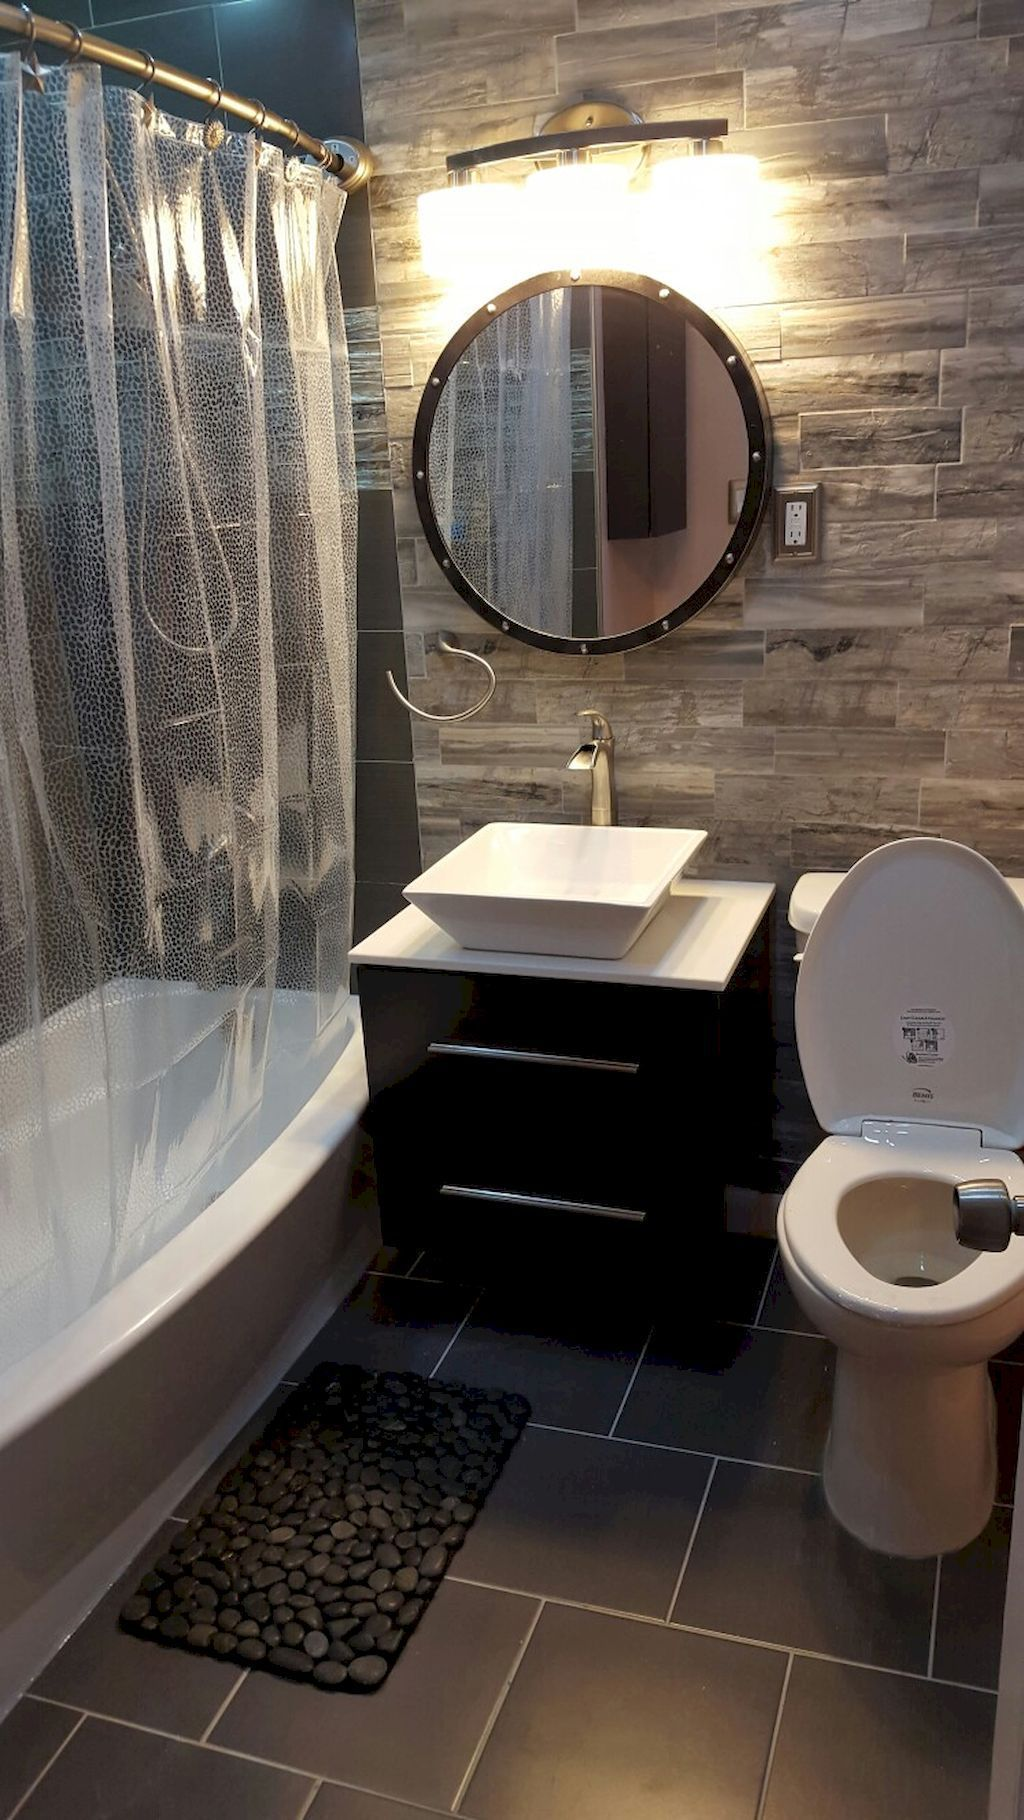 More Ideas Below #bathroomideas Bathroomremodel #bathroom Amazing Pictures Of Small Bathroom Makeovers Design Decoration